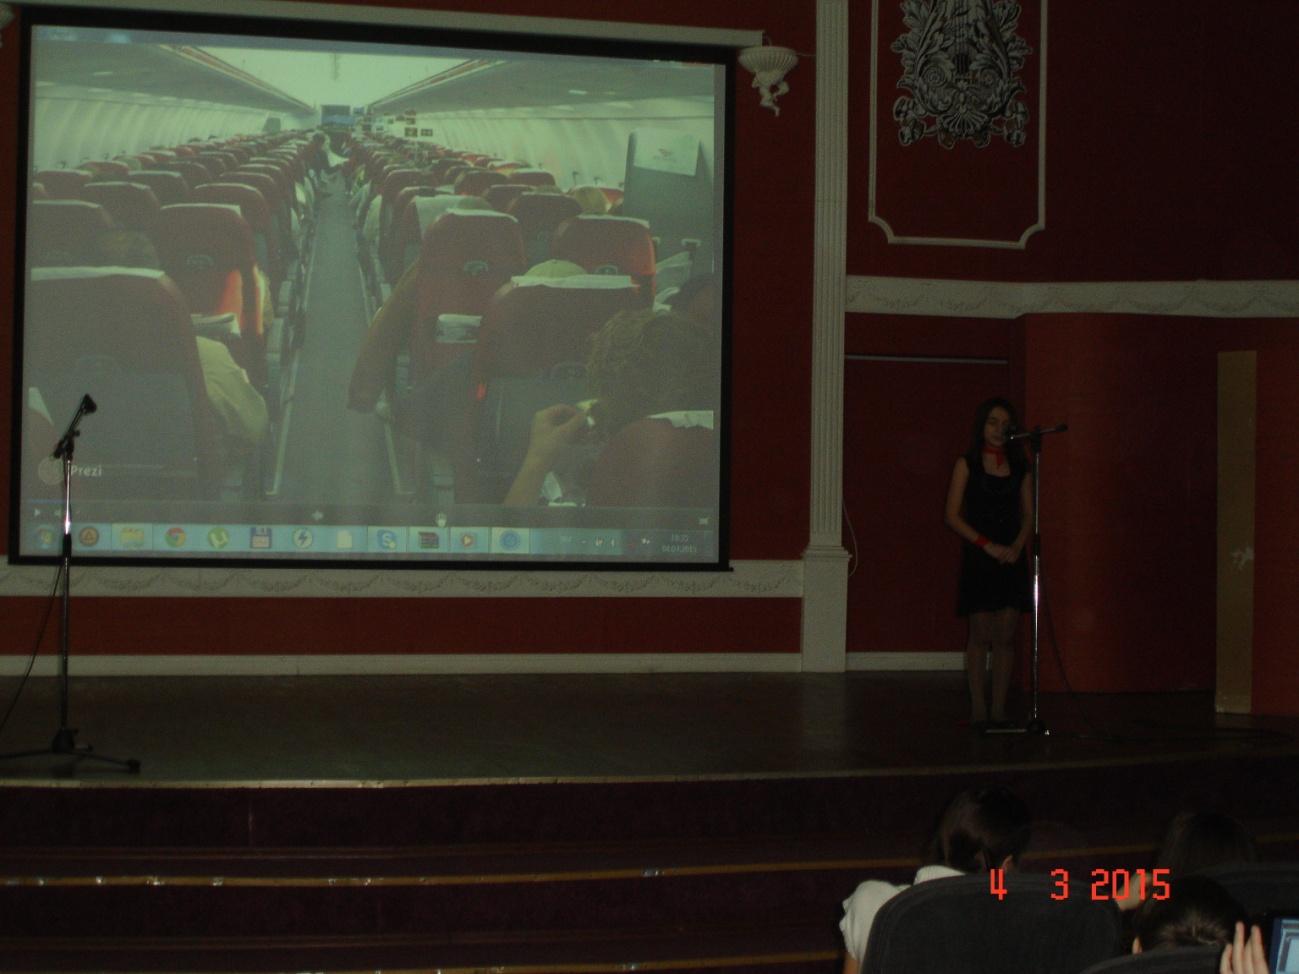 D:\Лилия\ПК\уч год 14-15\мероприятие МУзеи Лондона\DSC02490.JPG